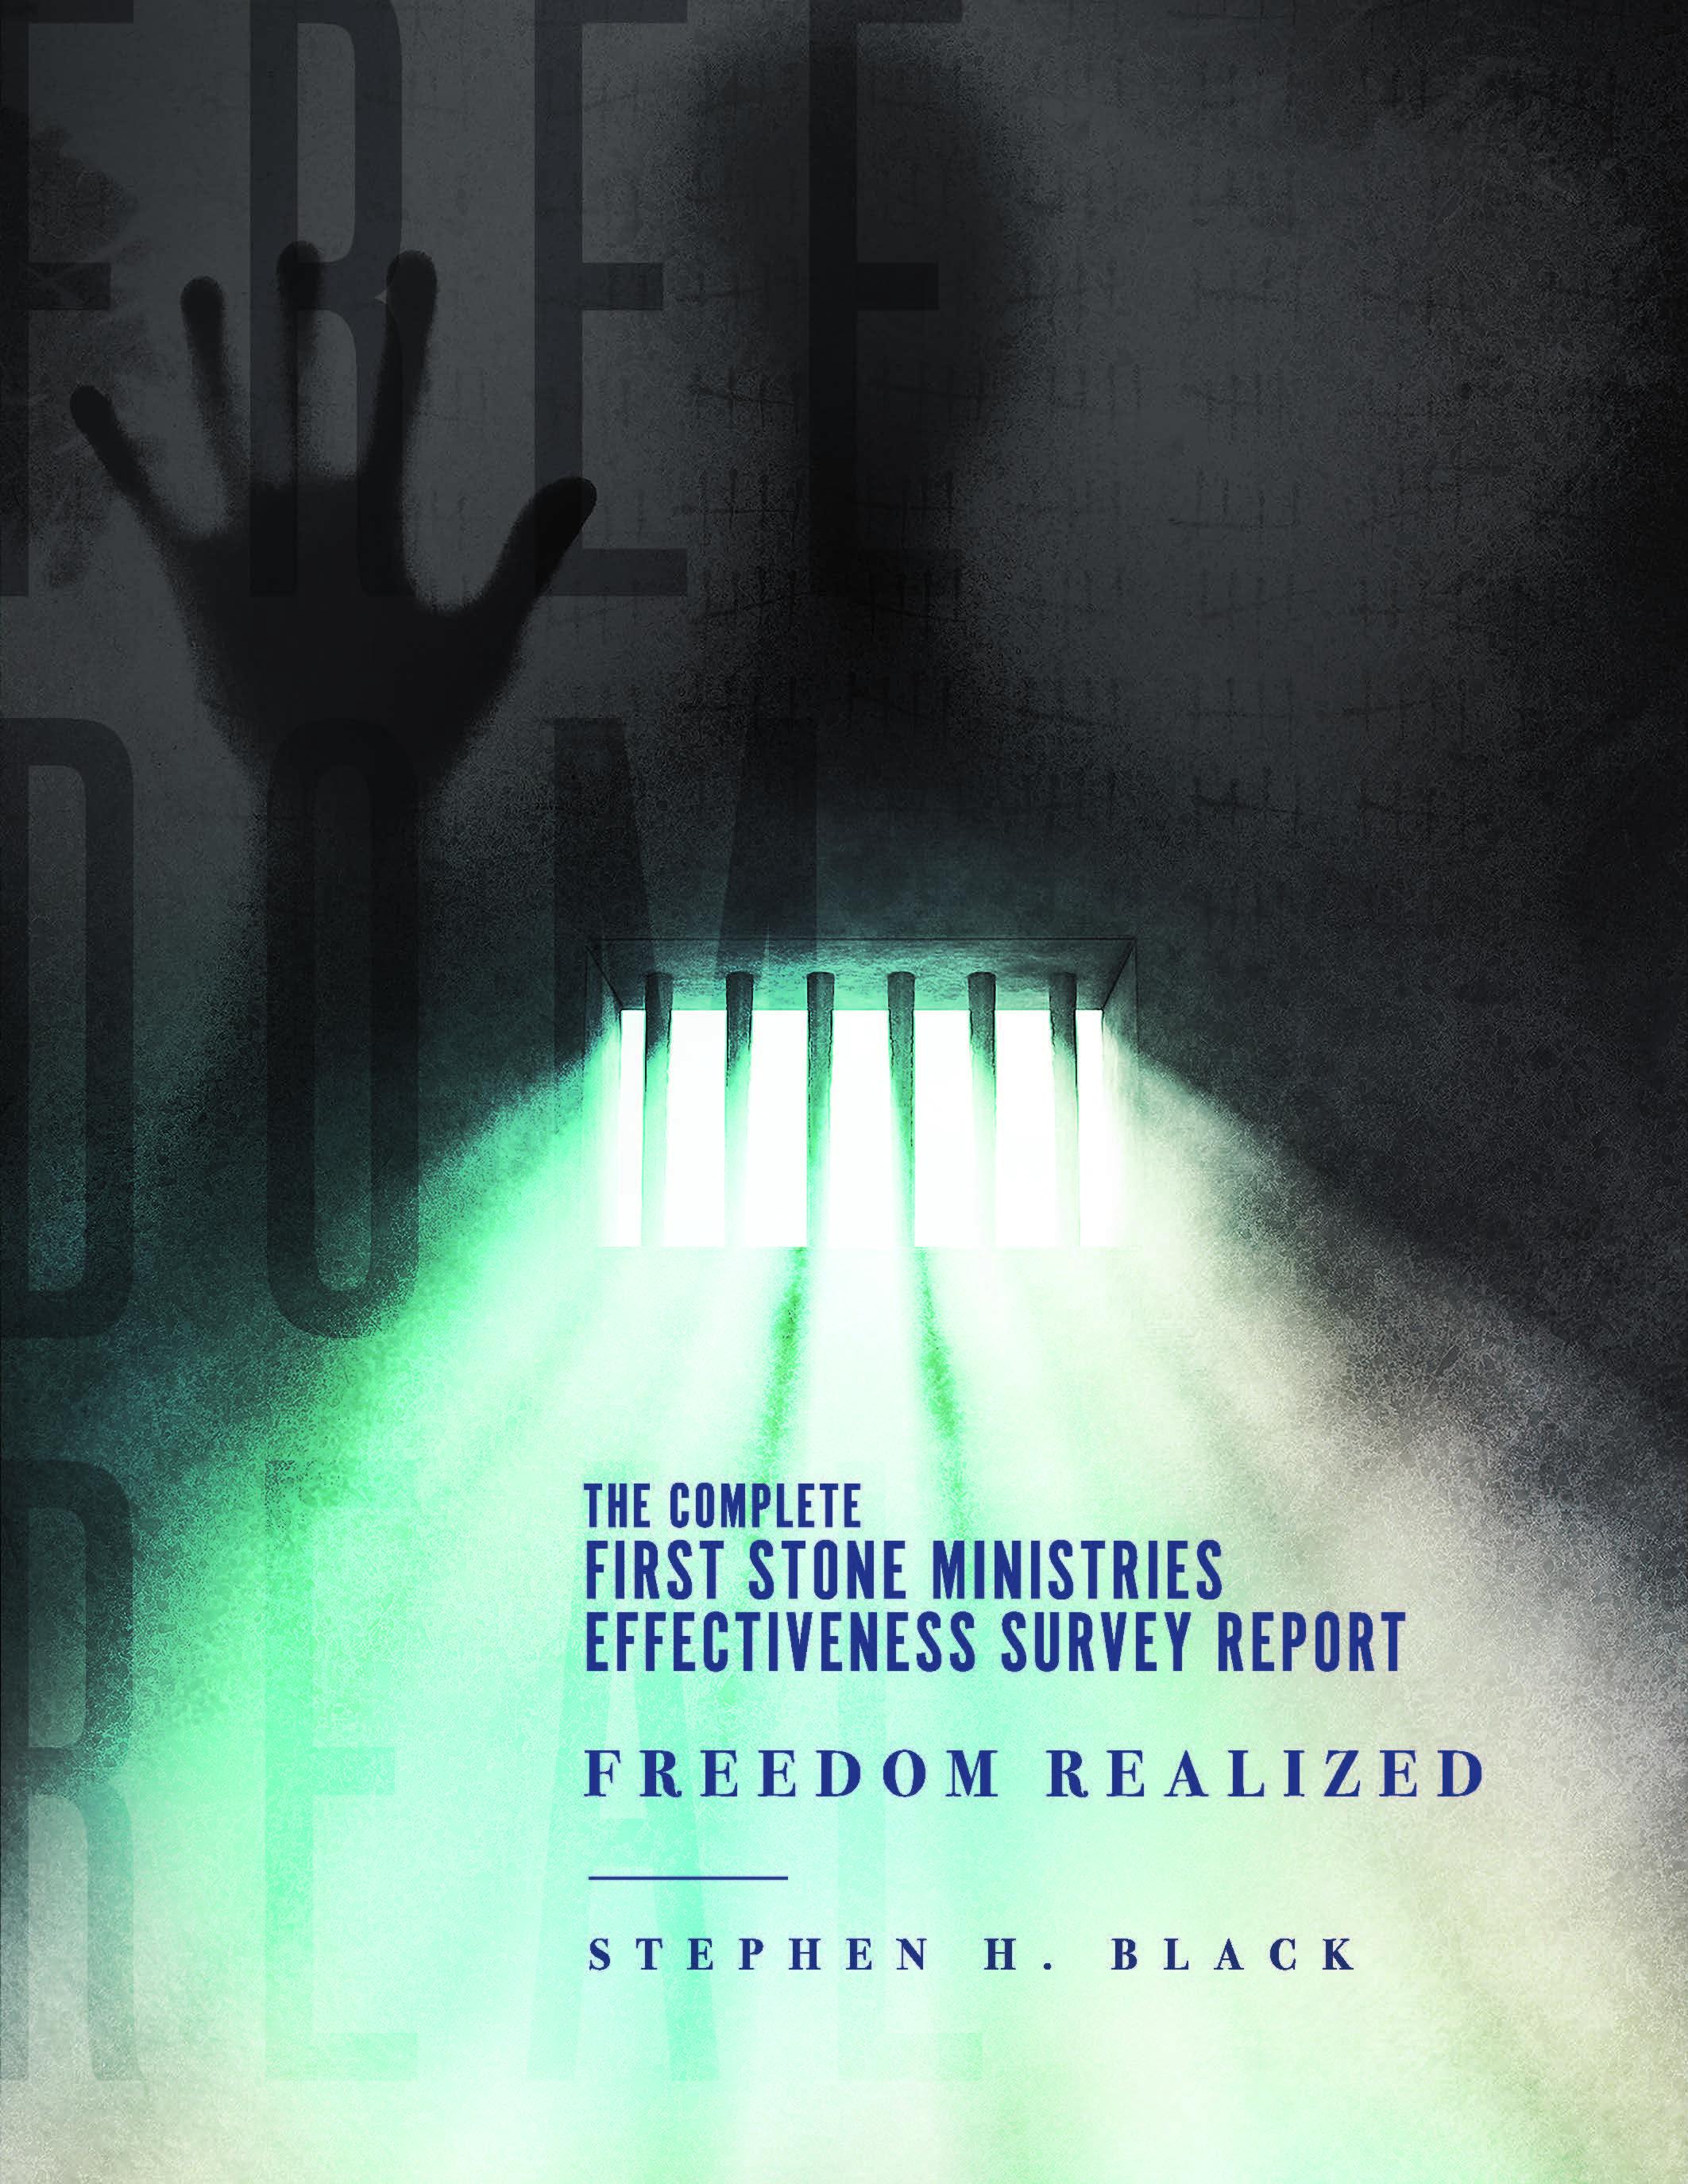 Freedom Realized Report 8_5x11